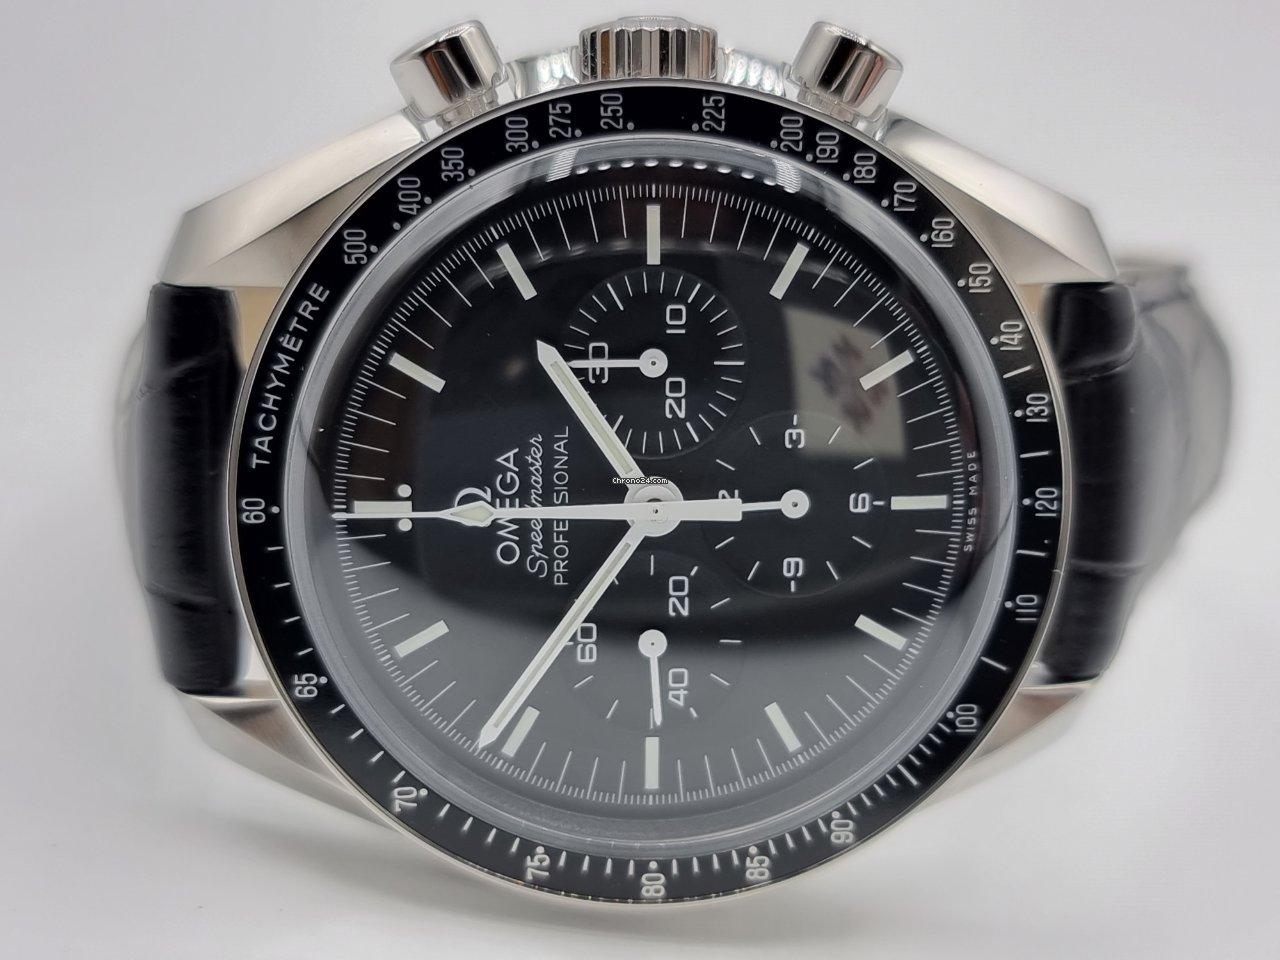 Omega Speedmaster Professional Moonwatch 311.33.42.30.01.001 2021 new